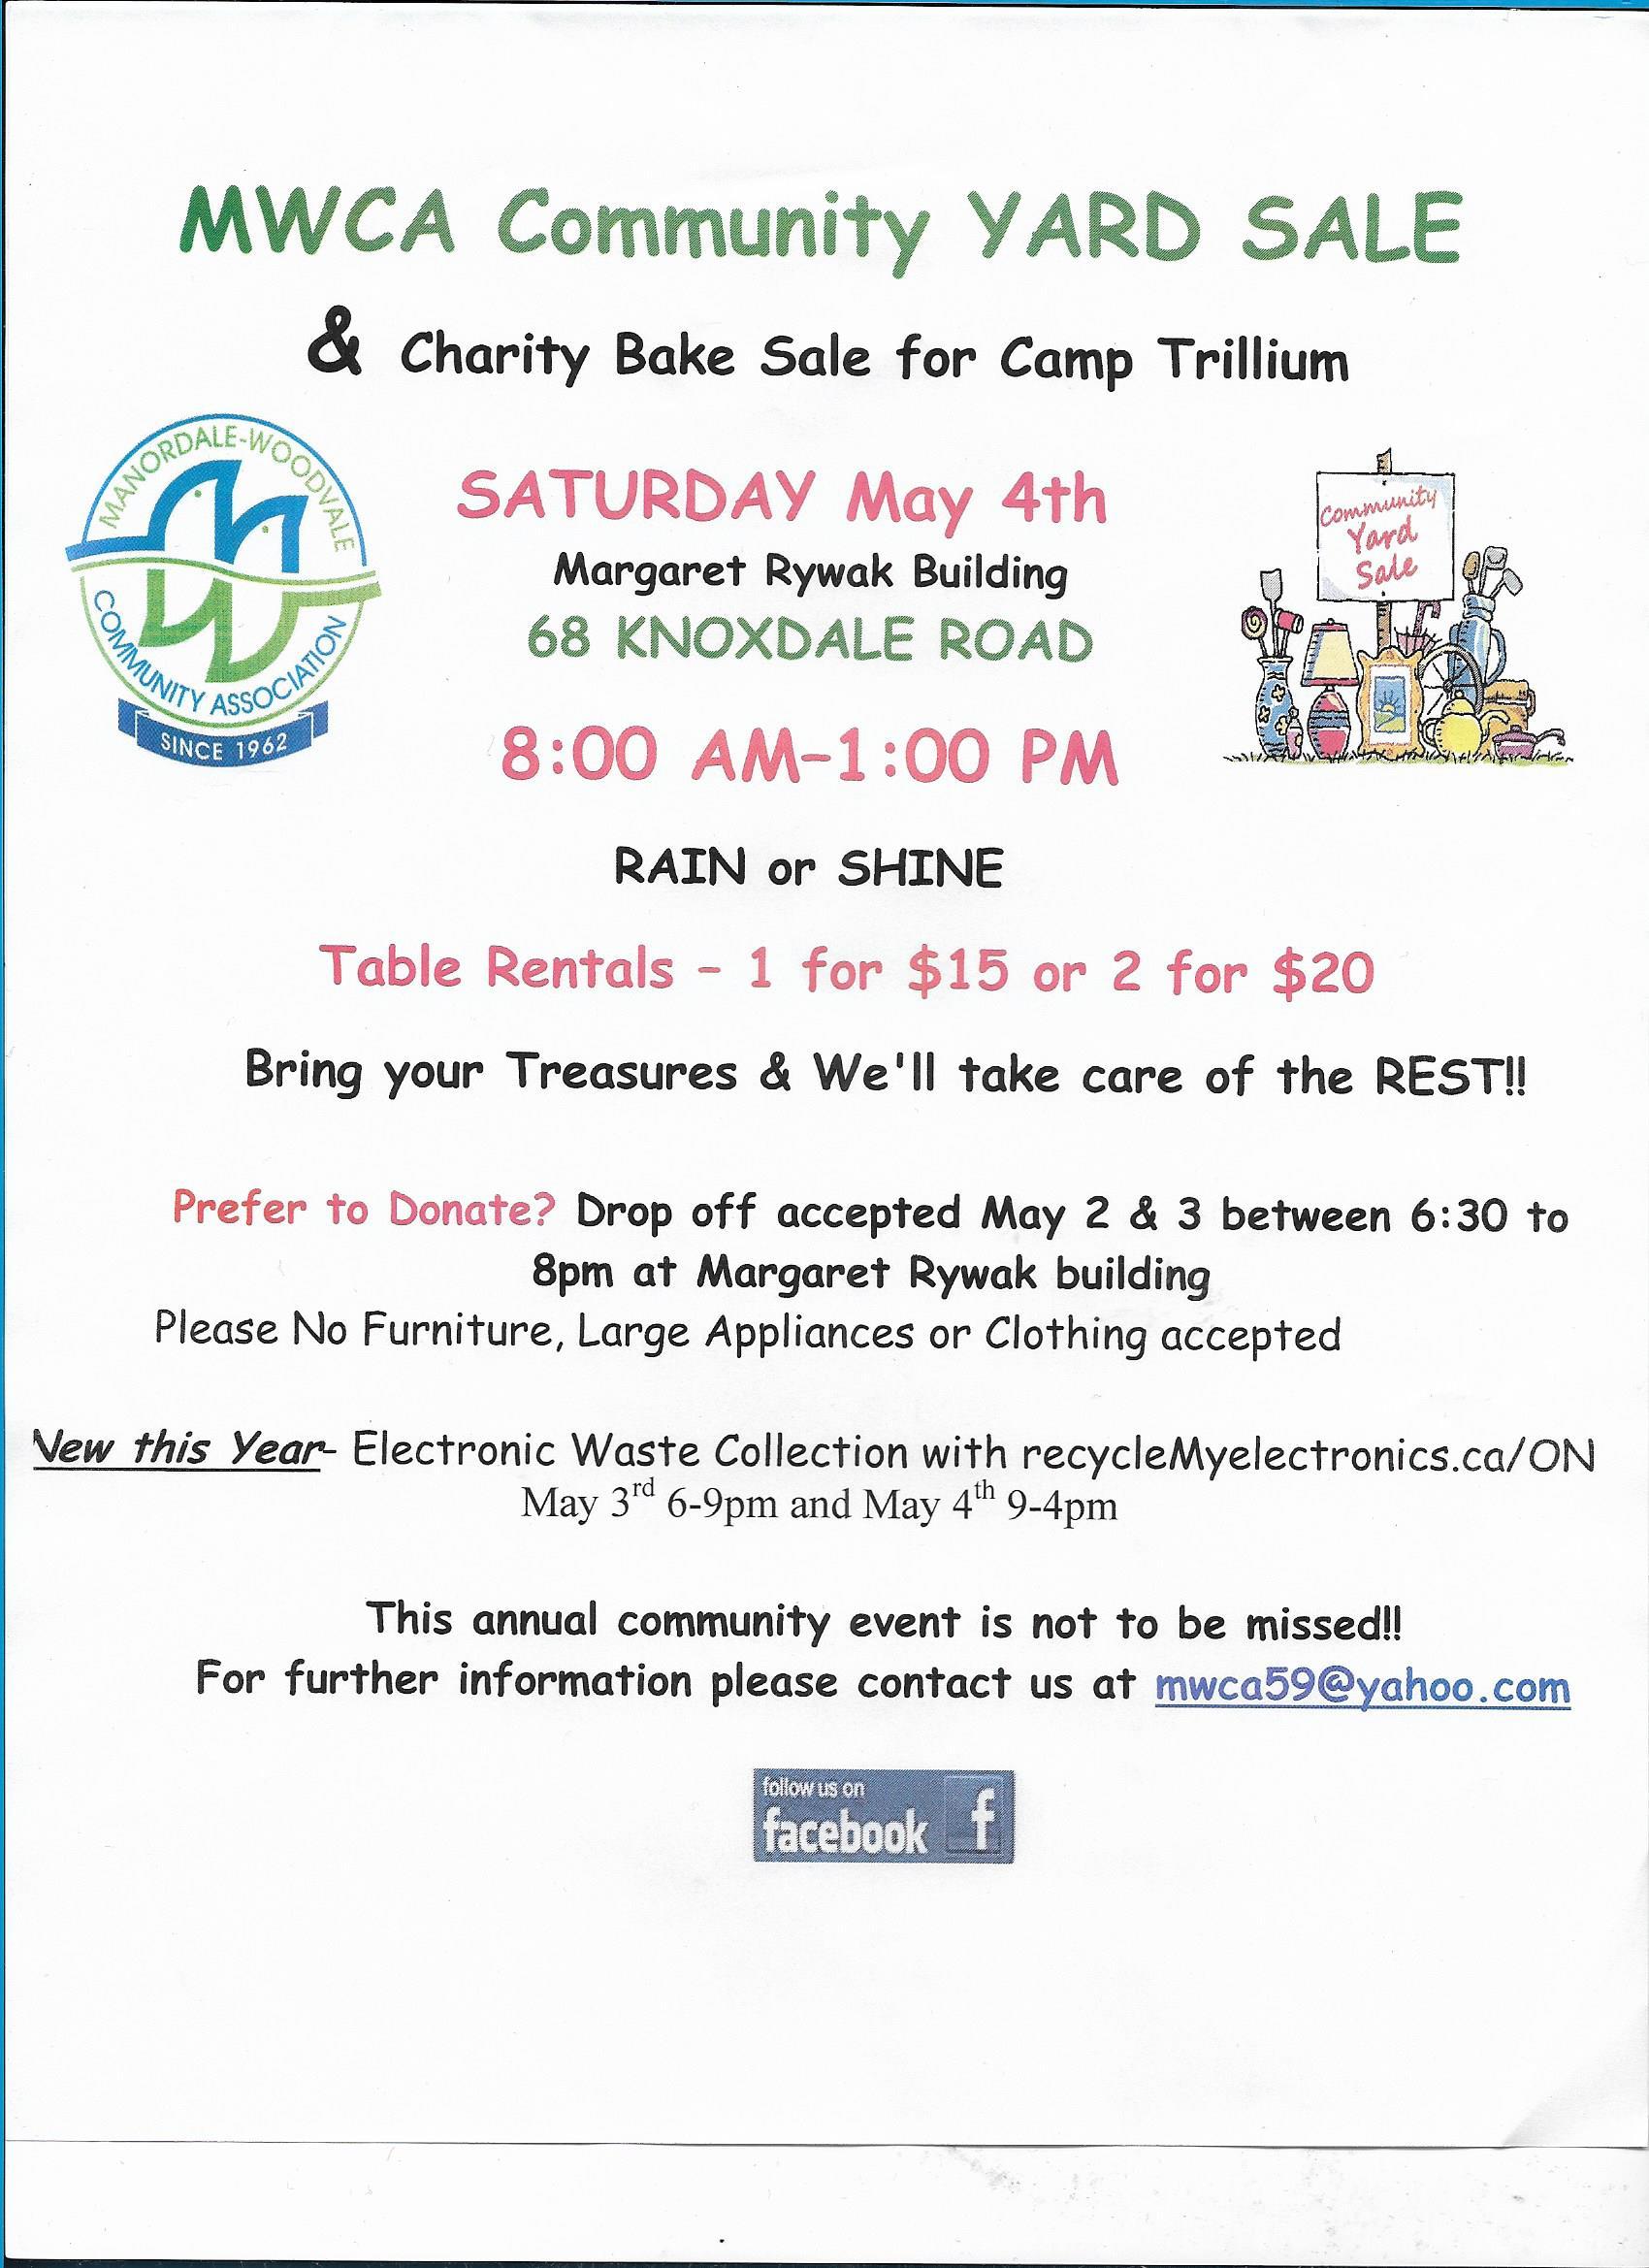 Garage Sale | Manordale-Woodvale Community Association (MWCA)